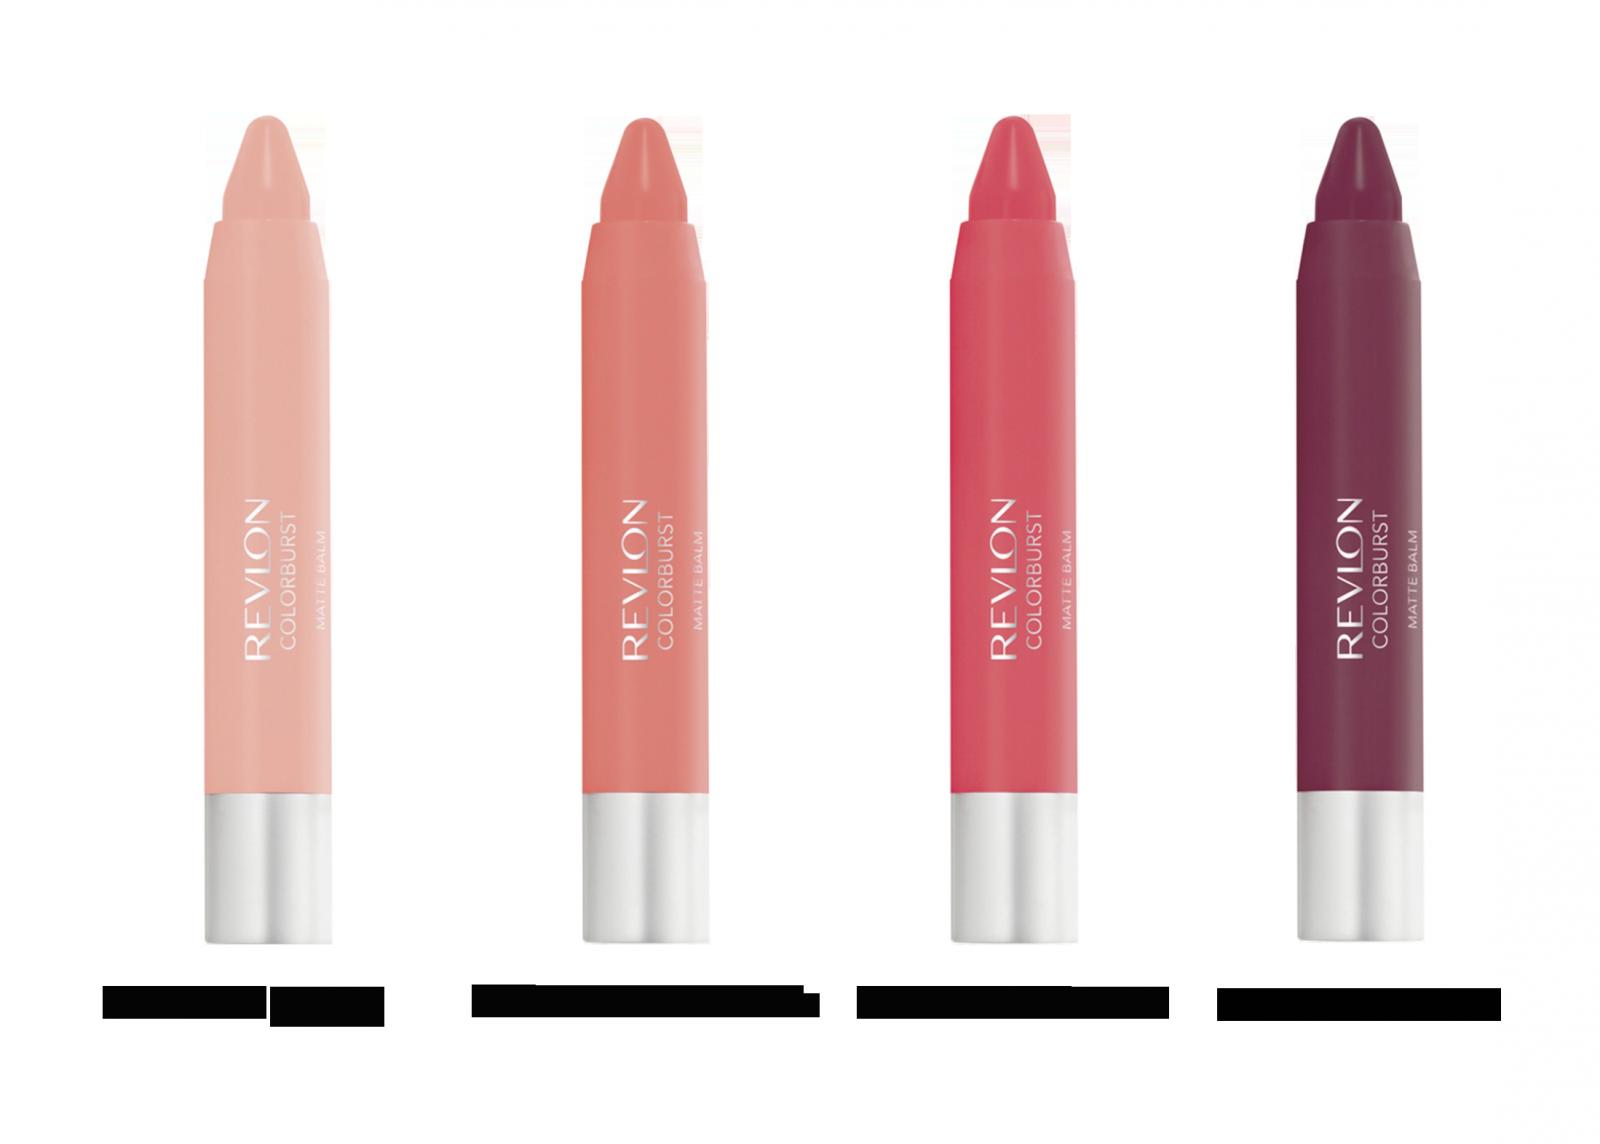 Revlon Colorburst Matte Balm 4 Types To Choose Hermo Online